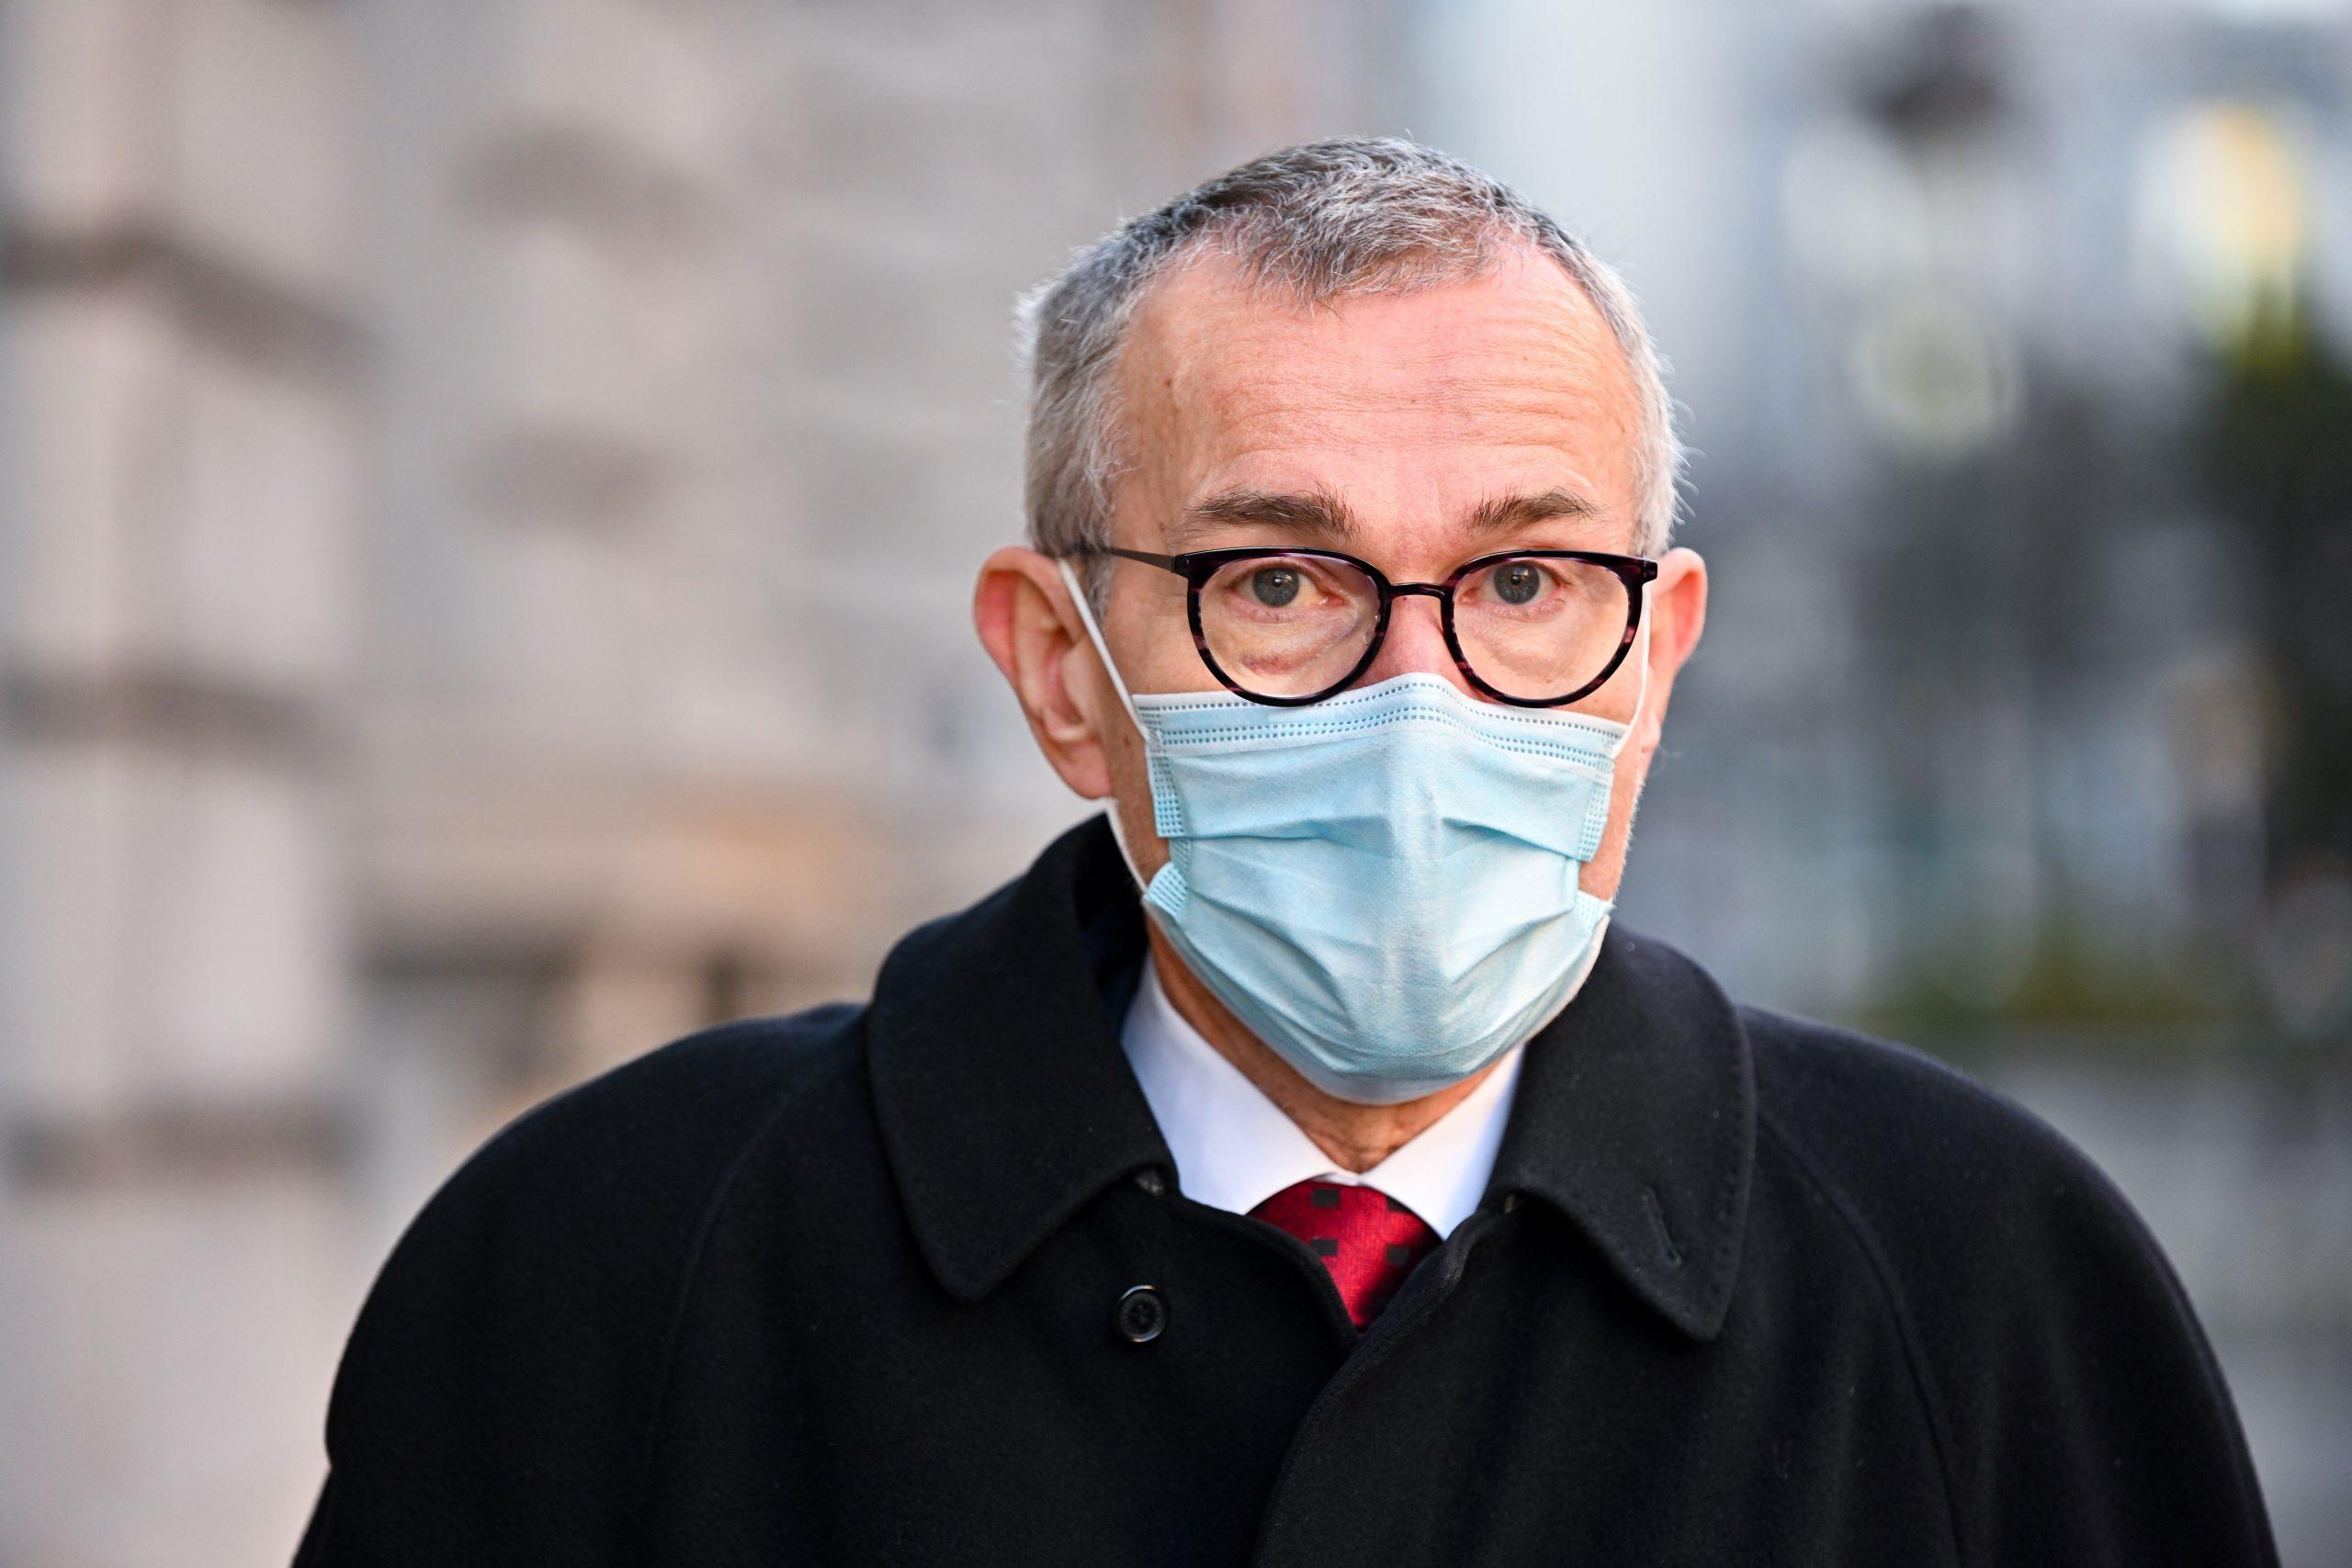 Belgian Minister of Health Frank Vandenbroucke in Brussels, Belgium, on February 26.